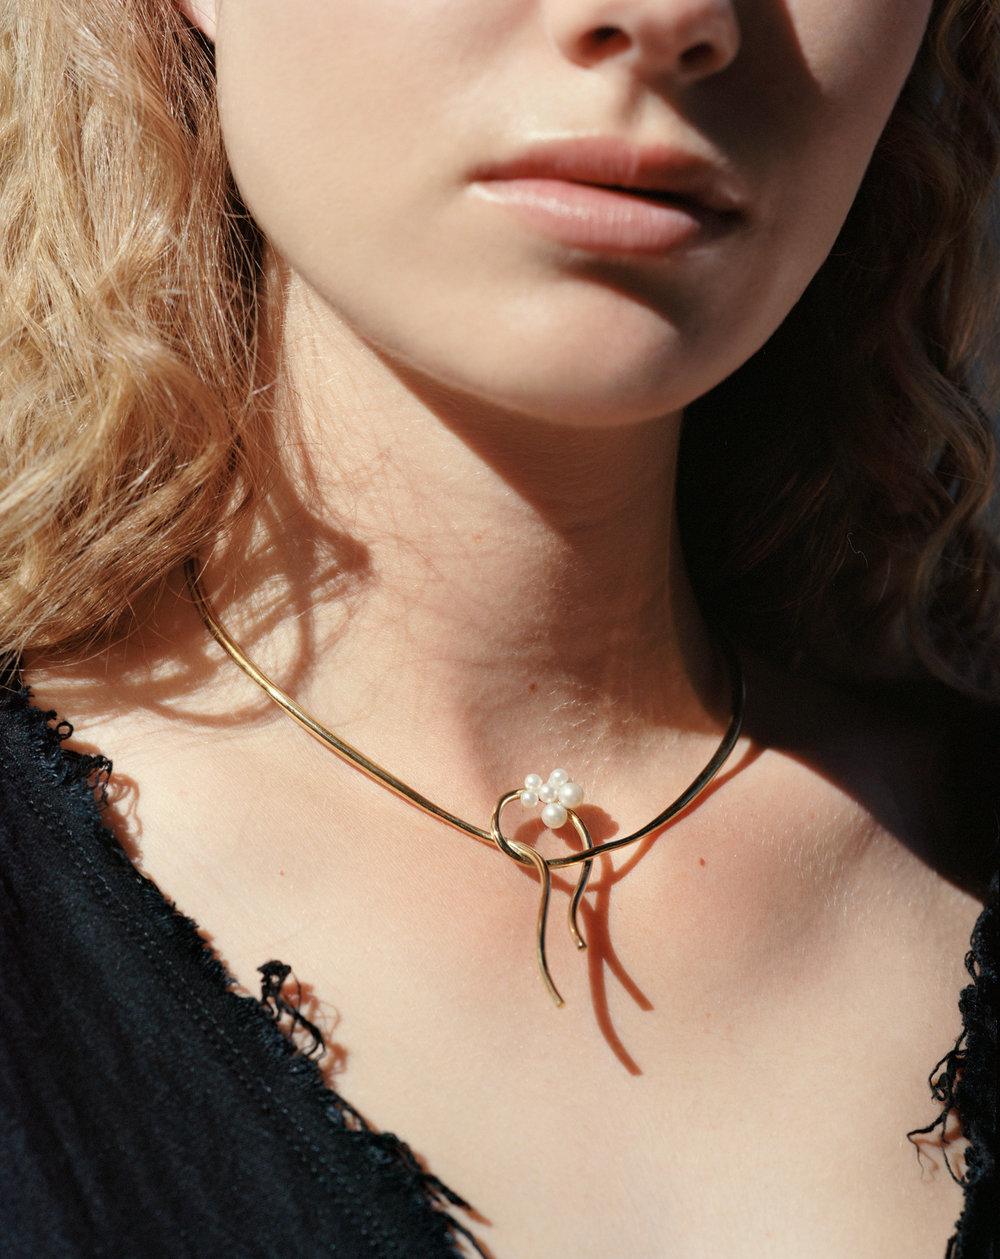 Rift Gold Vermeil Earring - £185   More details